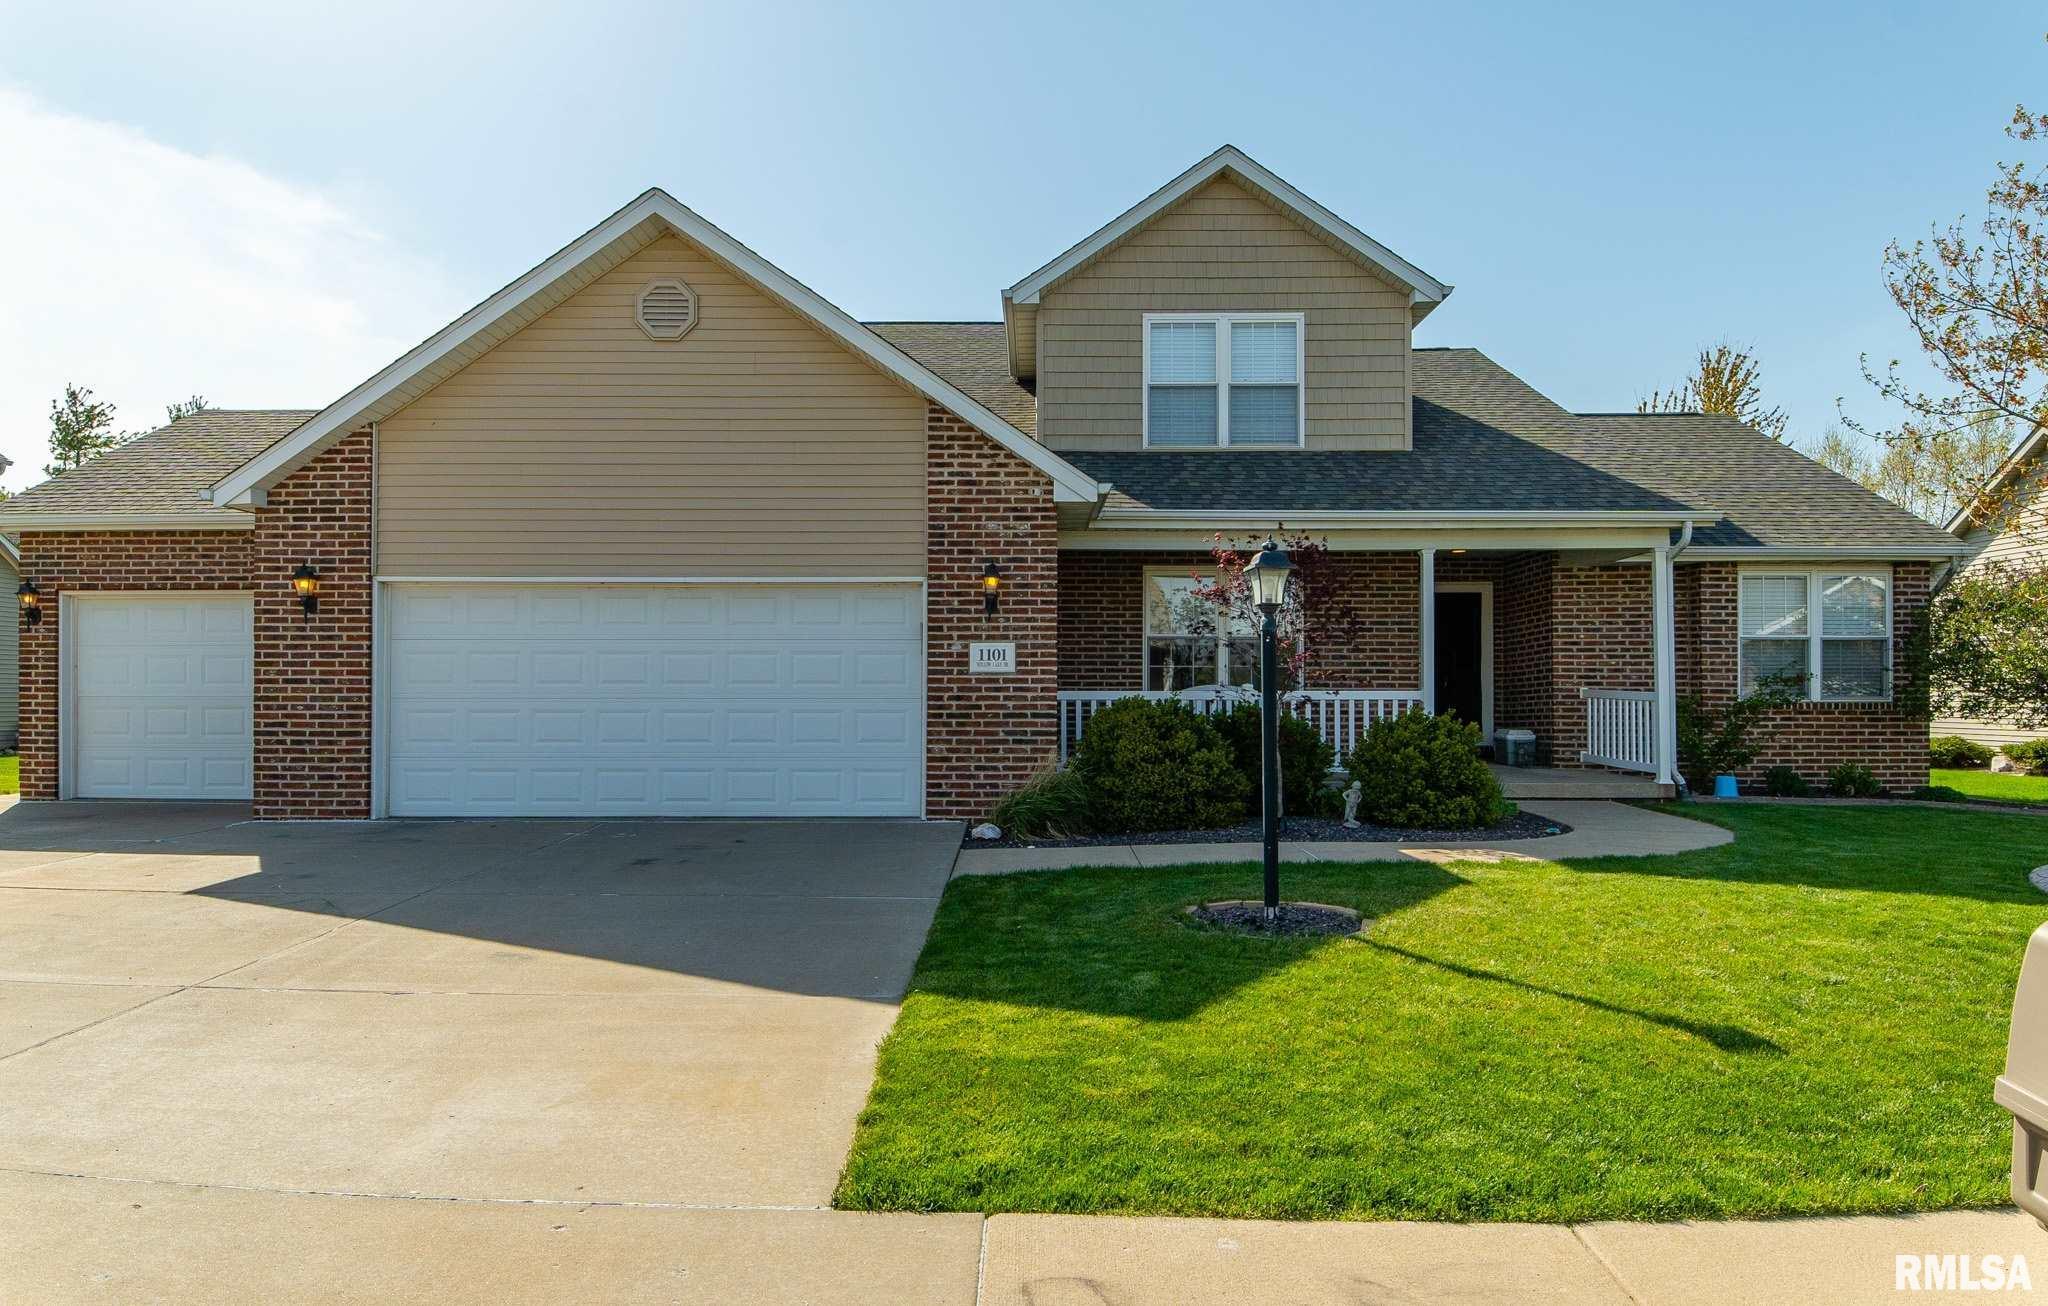 1101 WILLOW LAKE Property Photo - Metamora, IL real estate listing